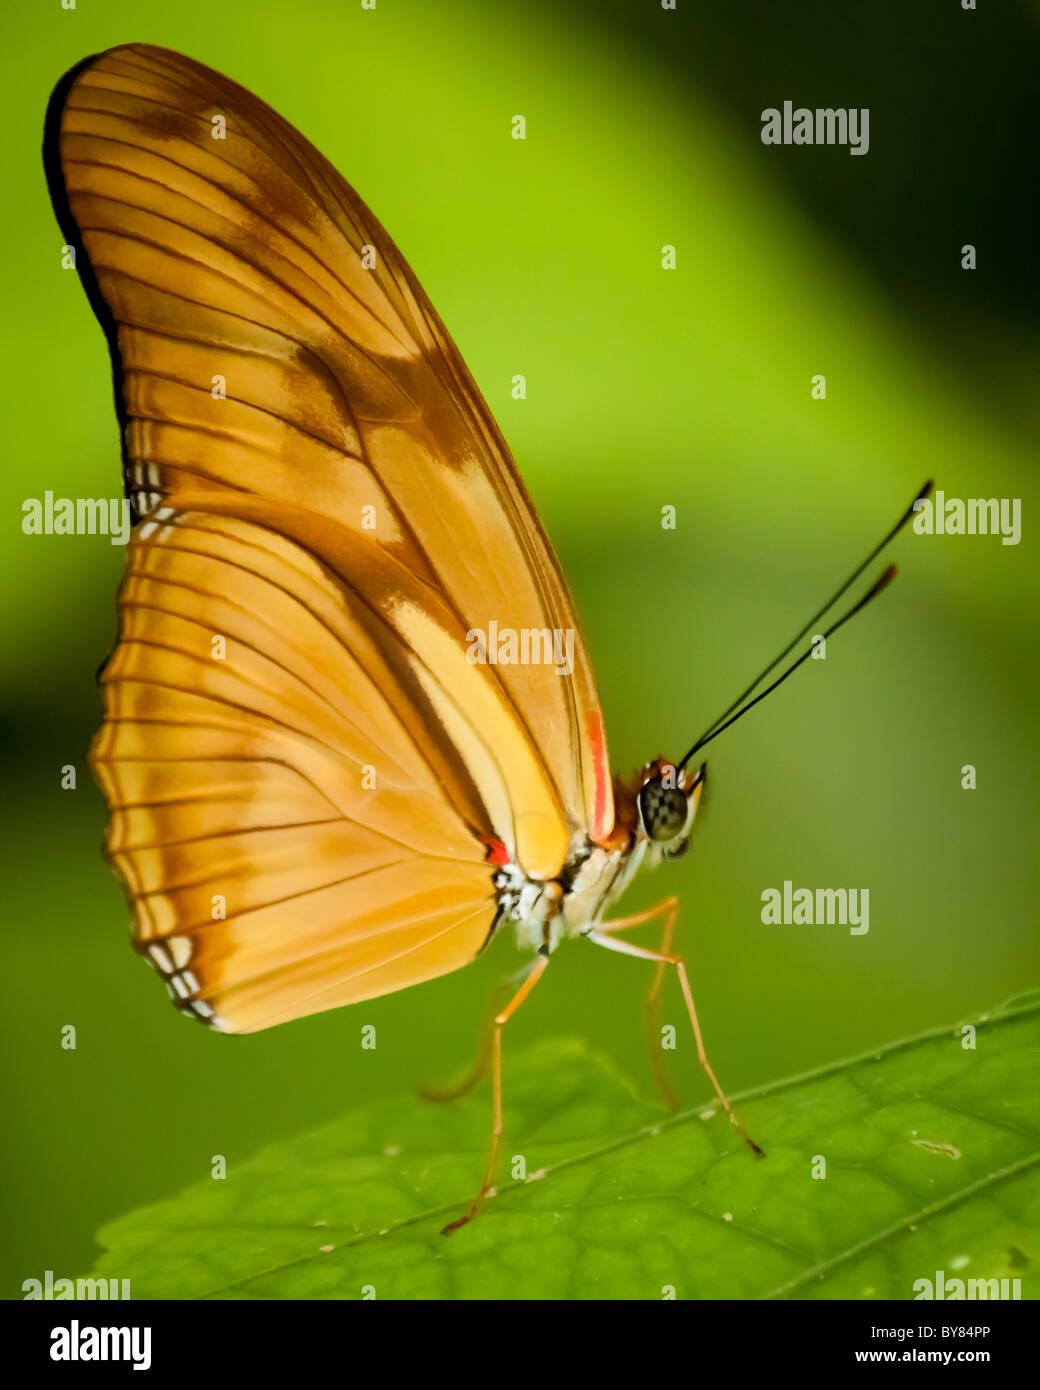 Butterfly Macro - Stock Image